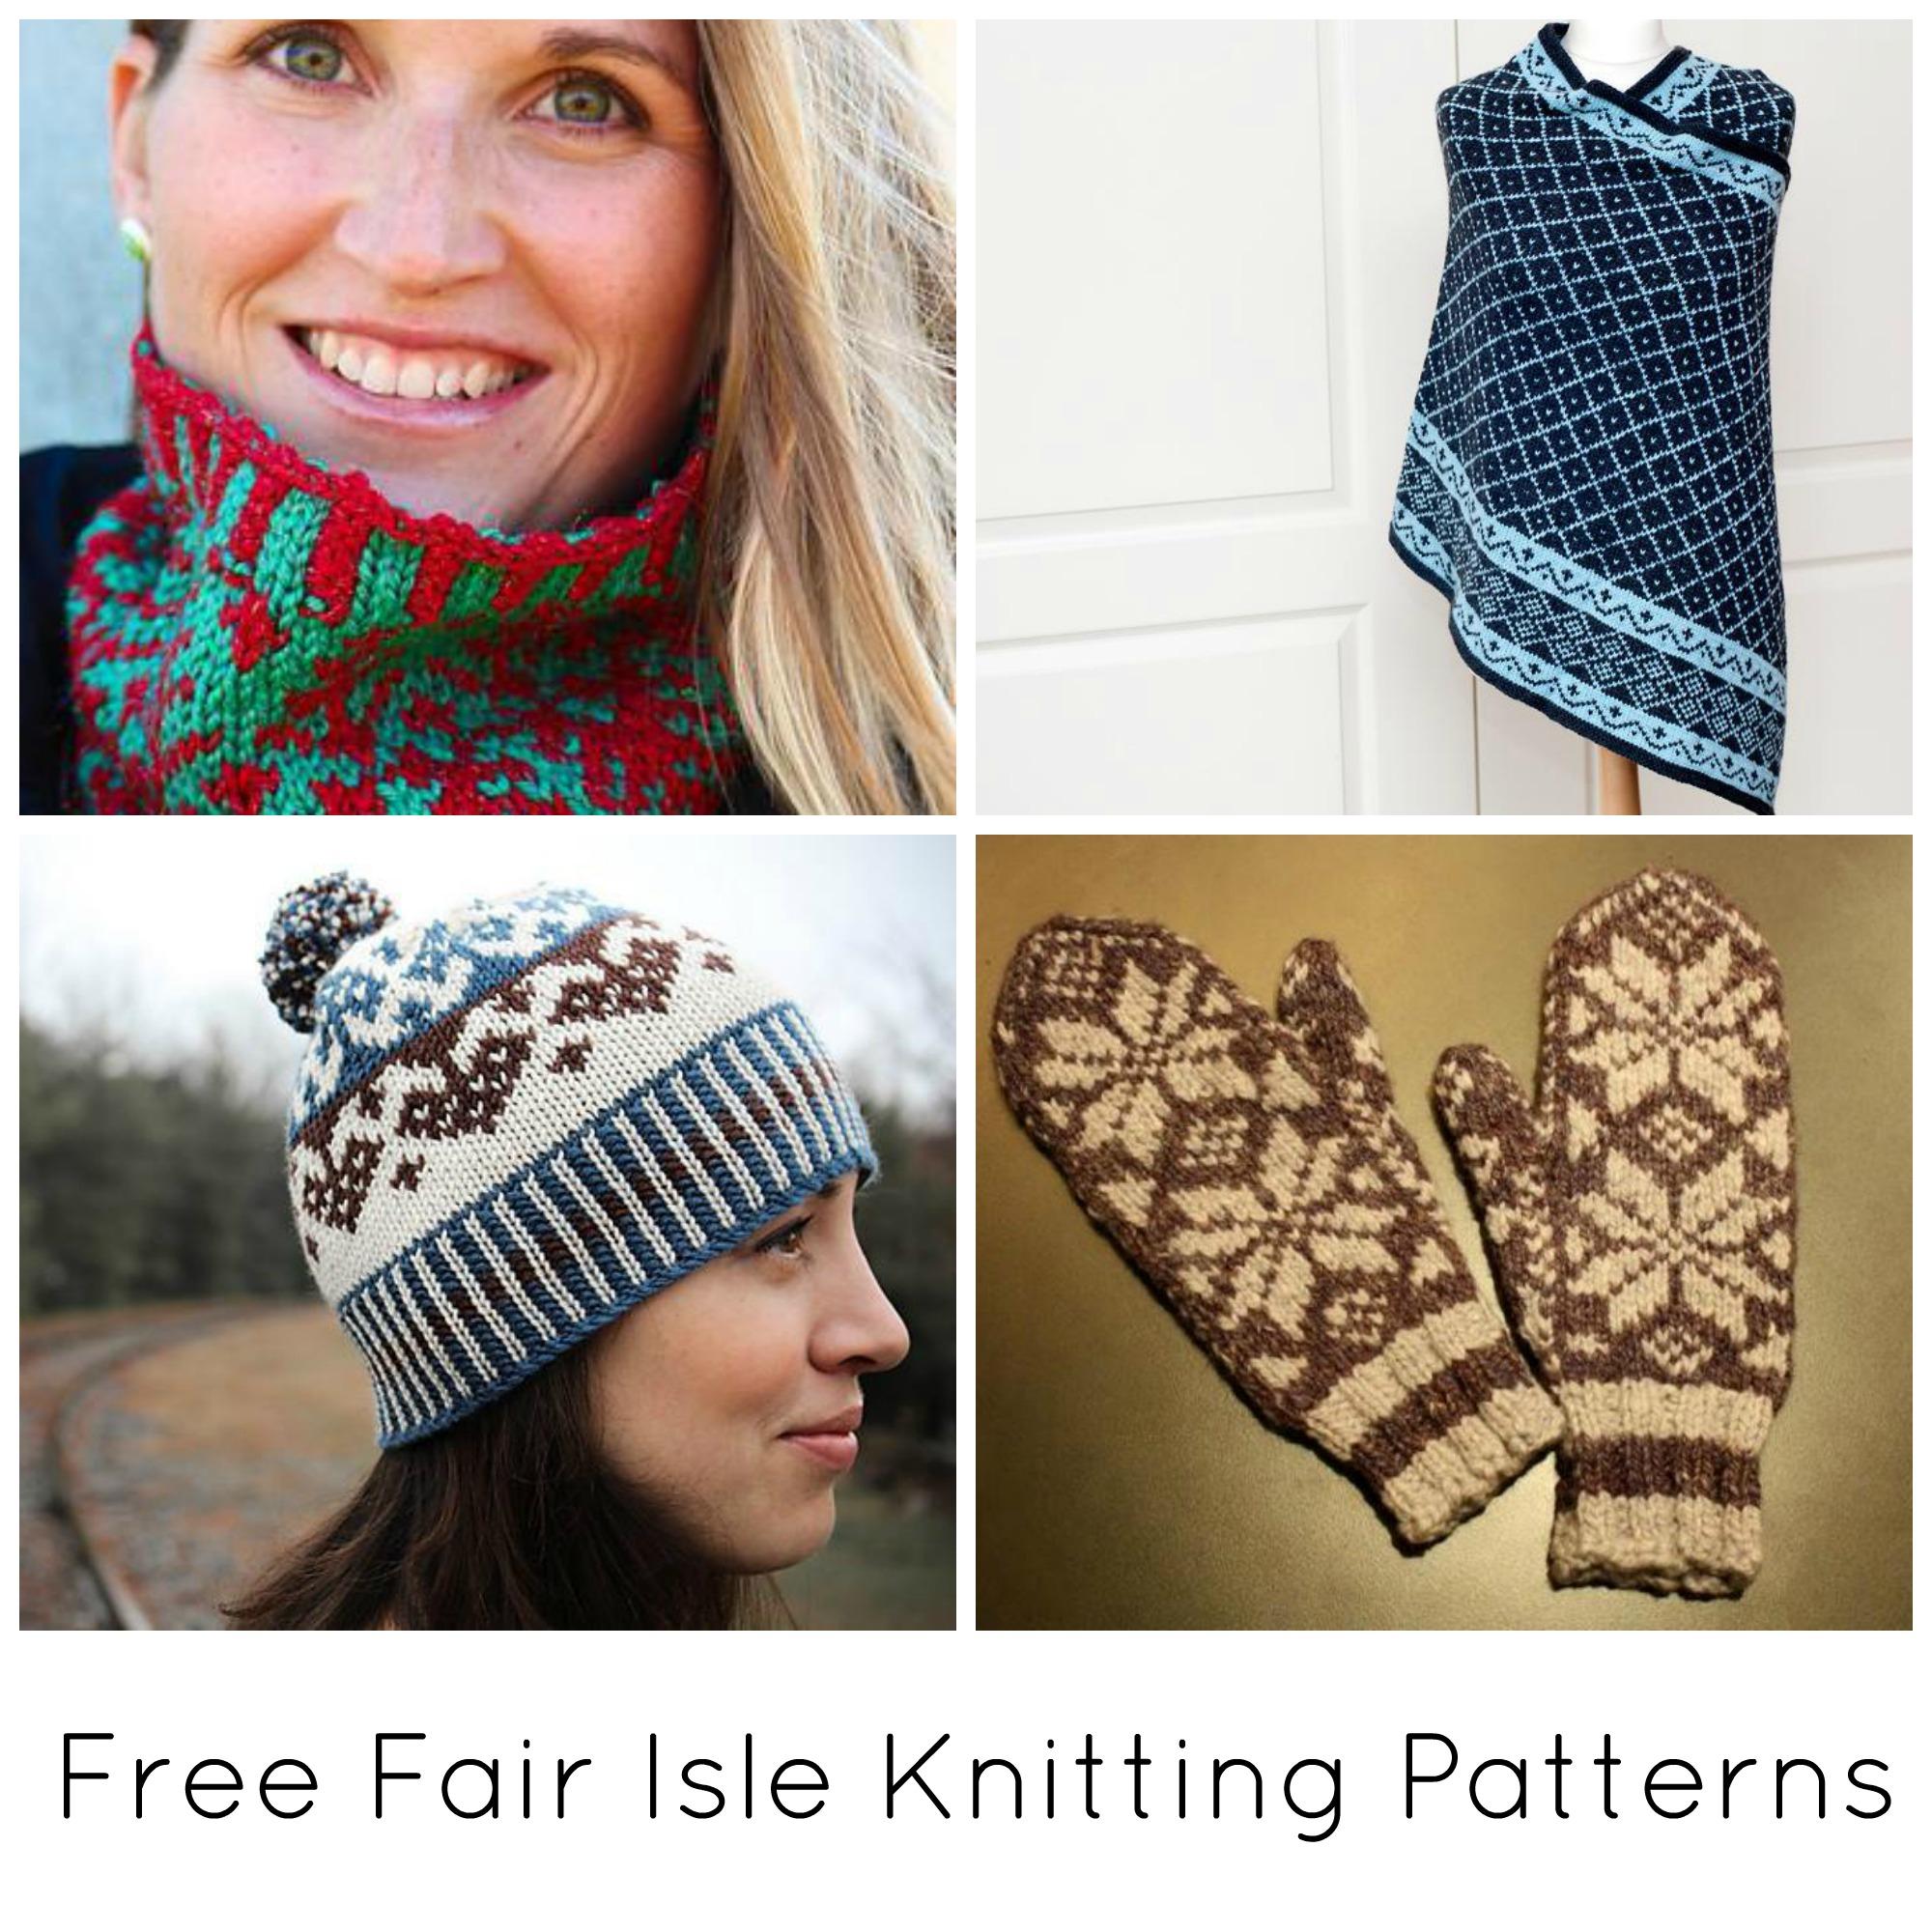 Colorwork Knitting Patterns Hats 10 Free Fair Isle Knitting Patterns On Craftsy